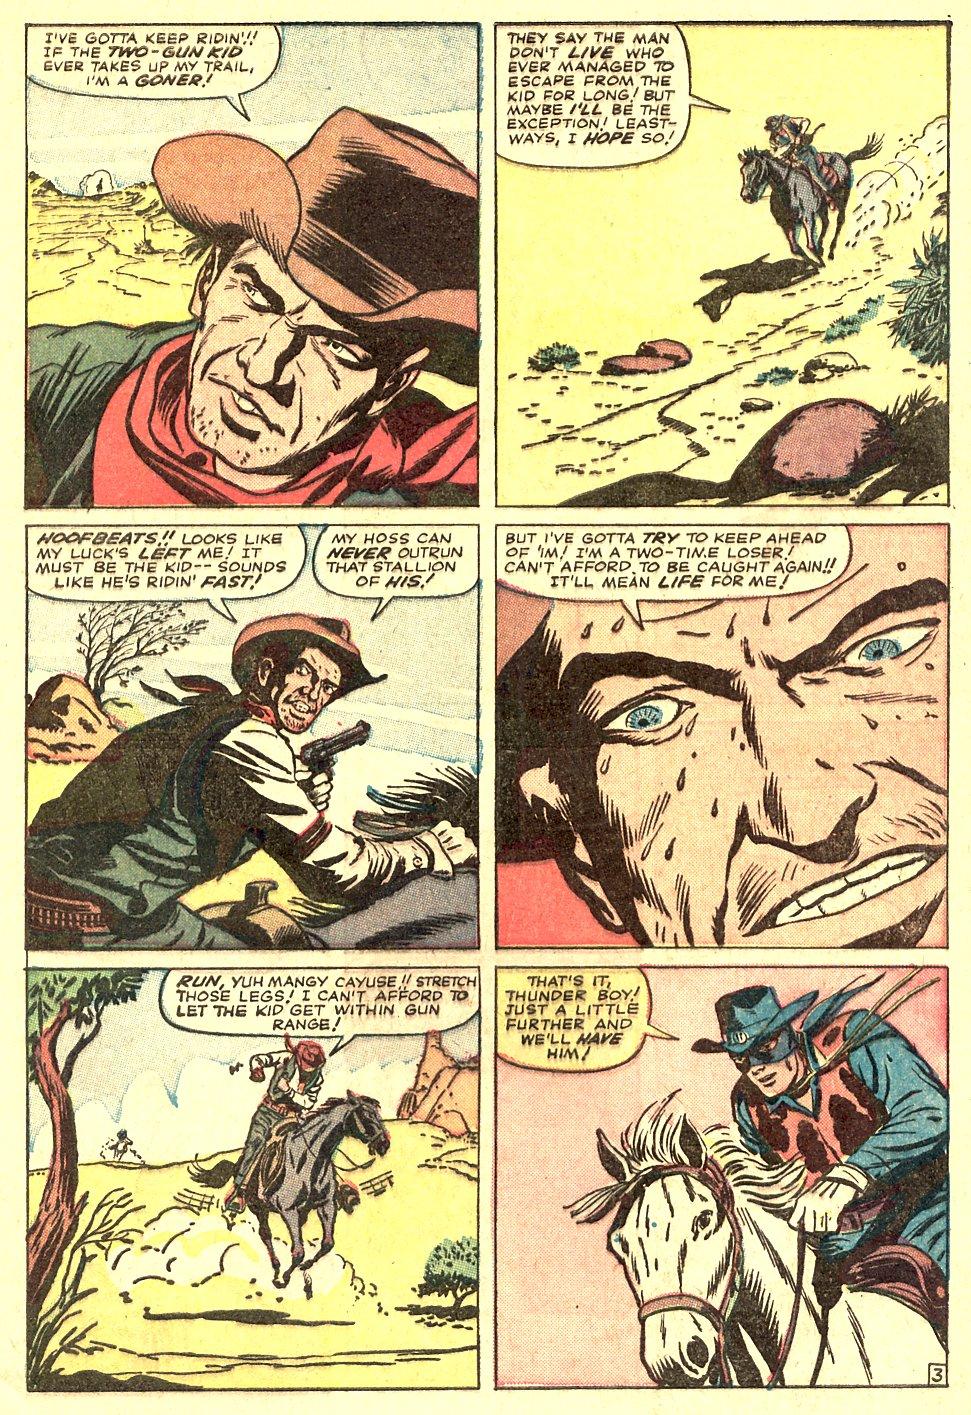 Read online Two-Gun Kid comic -  Issue #70 - 5